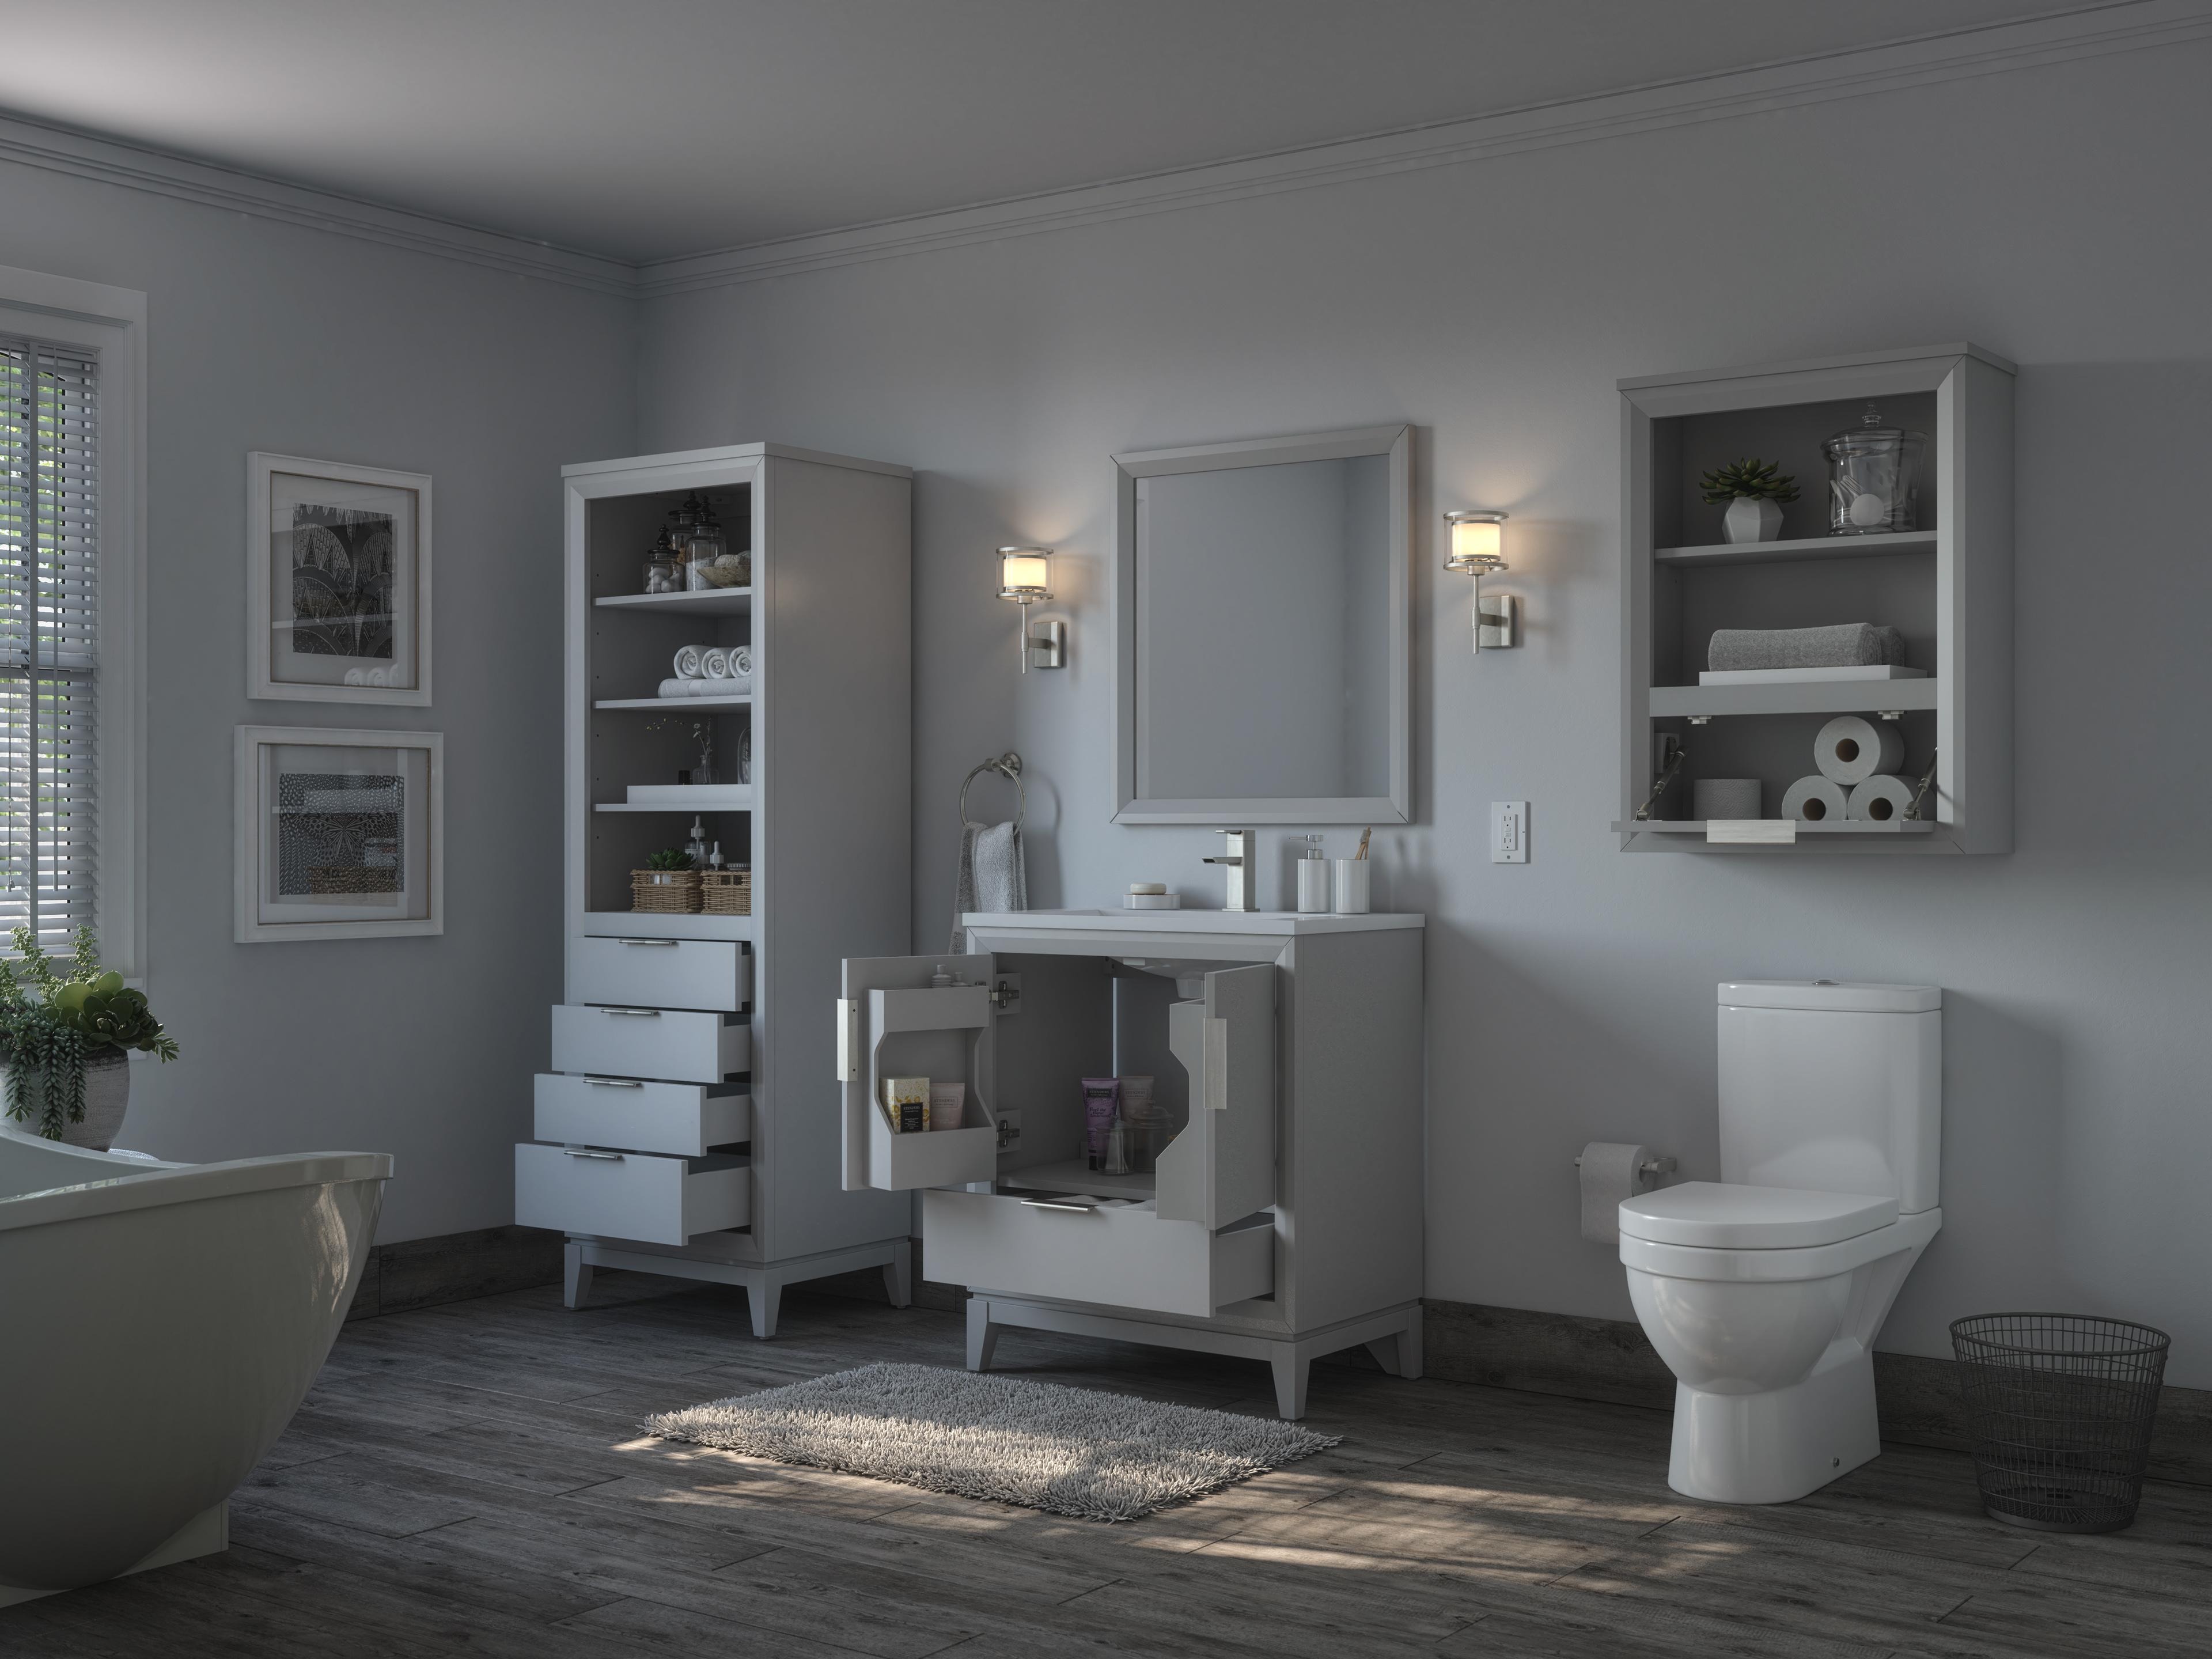 Robinson Bathroom Vanities Collection By Scott Living